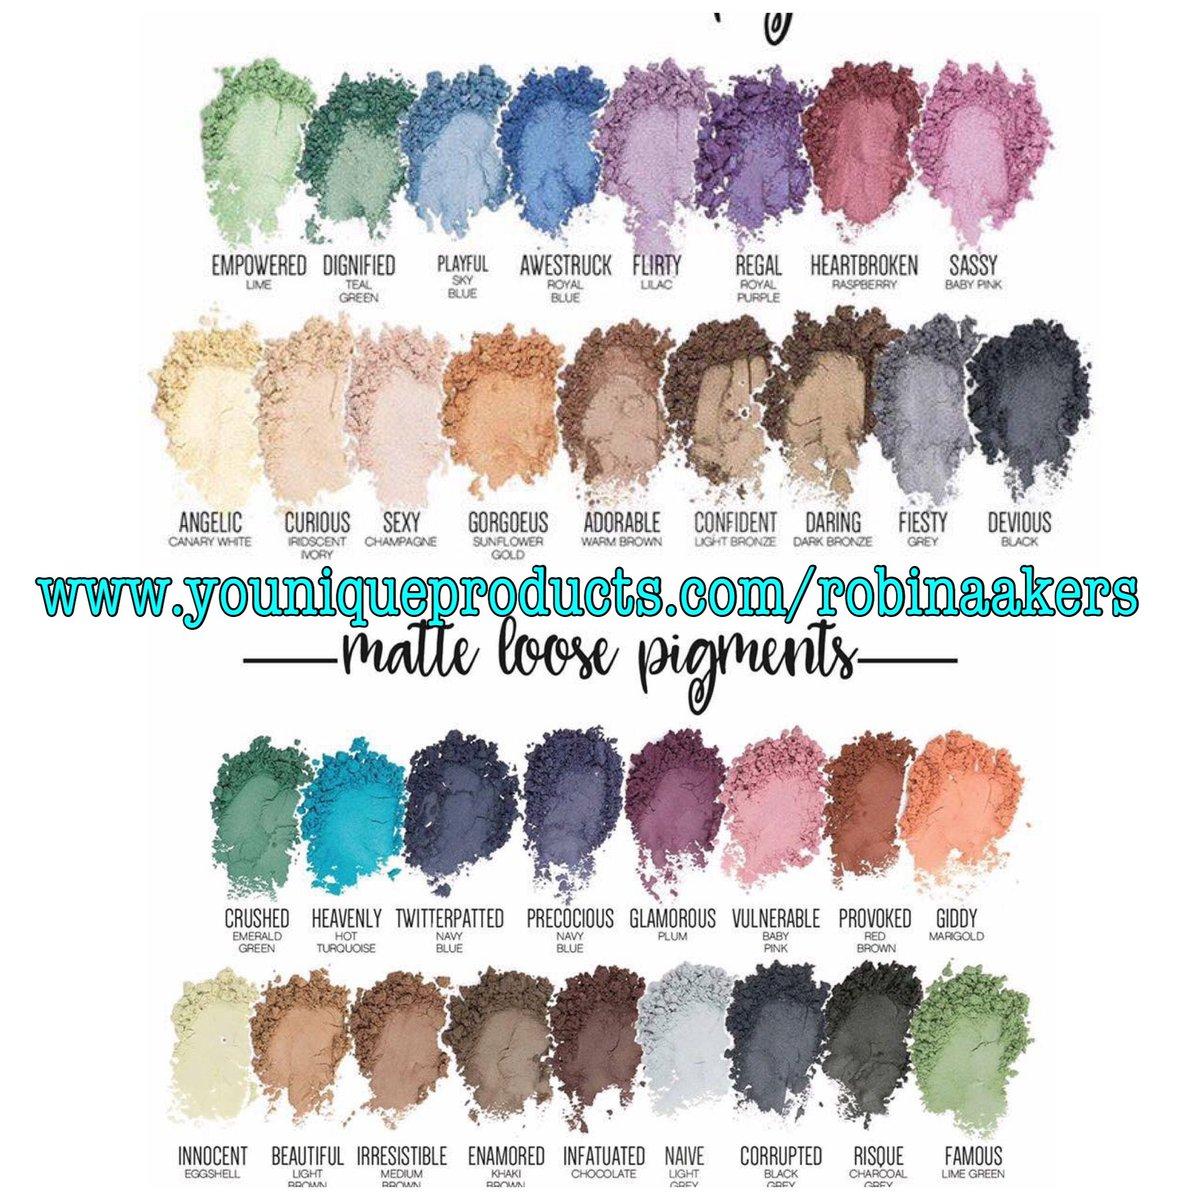 Shimmer &amp; Matte Pigments #Makeup #EyeShadow #Shimmer #Matte #Pigments<br>http://pic.twitter.com/qrRpnYSCIm